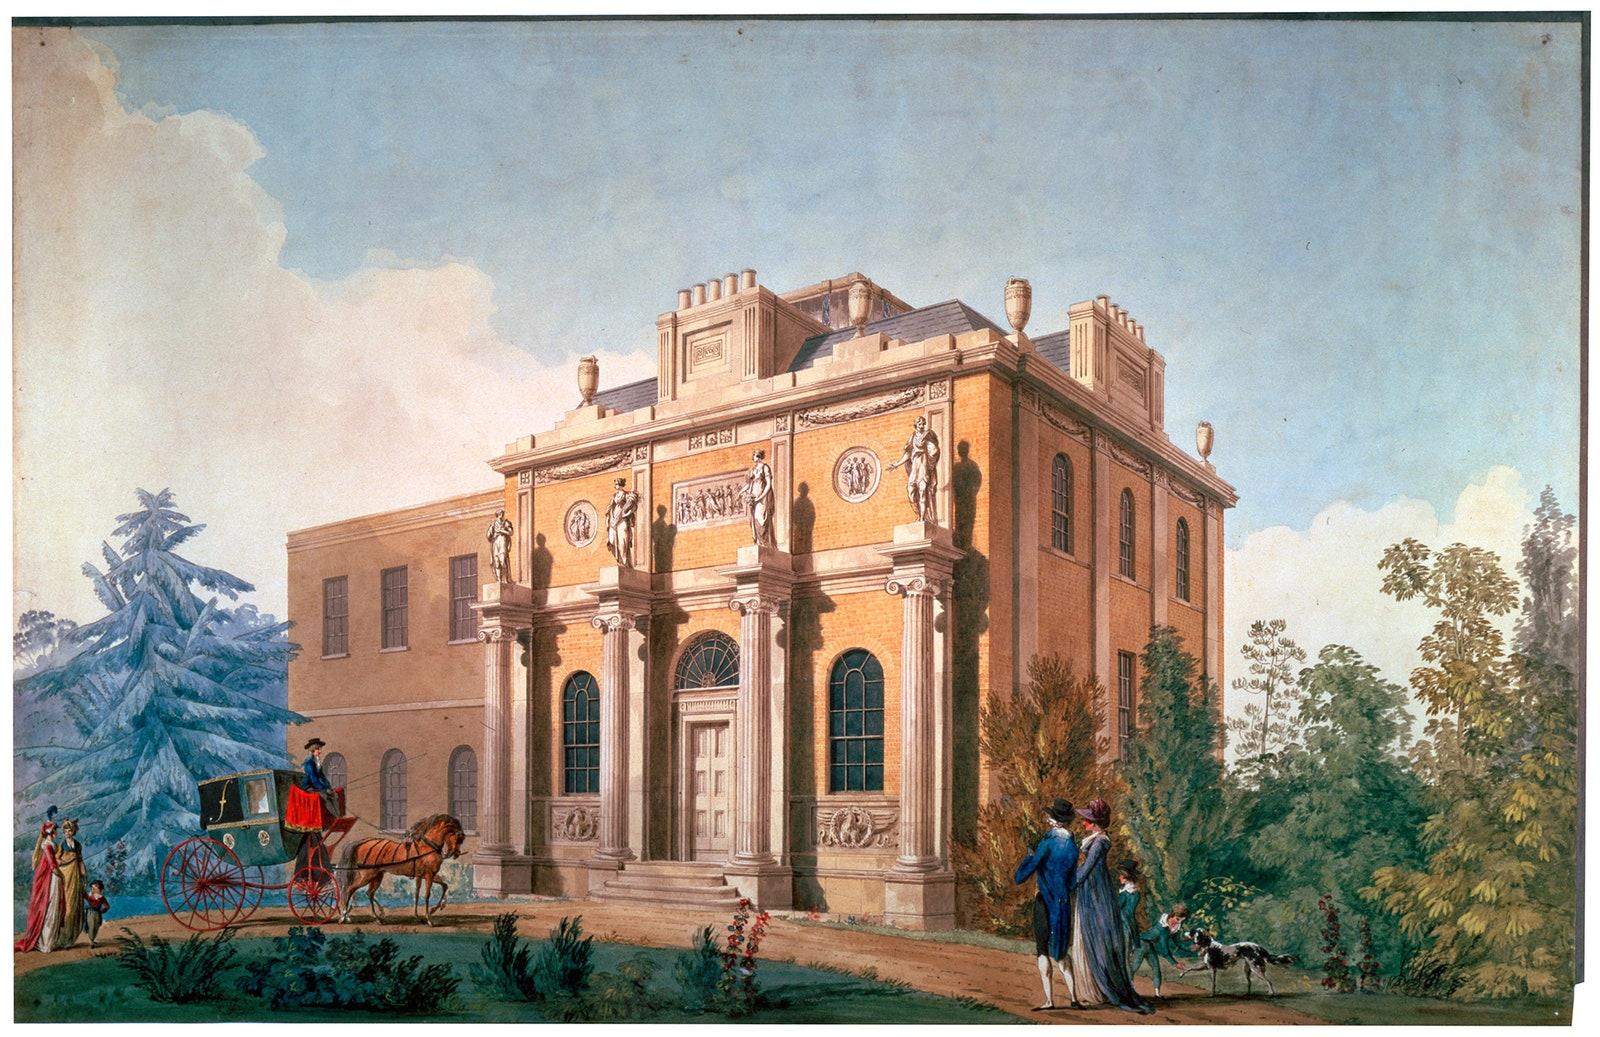 Pitzhanger Manor Joseph Gandy 1800.  Sir John Soanes Museum London